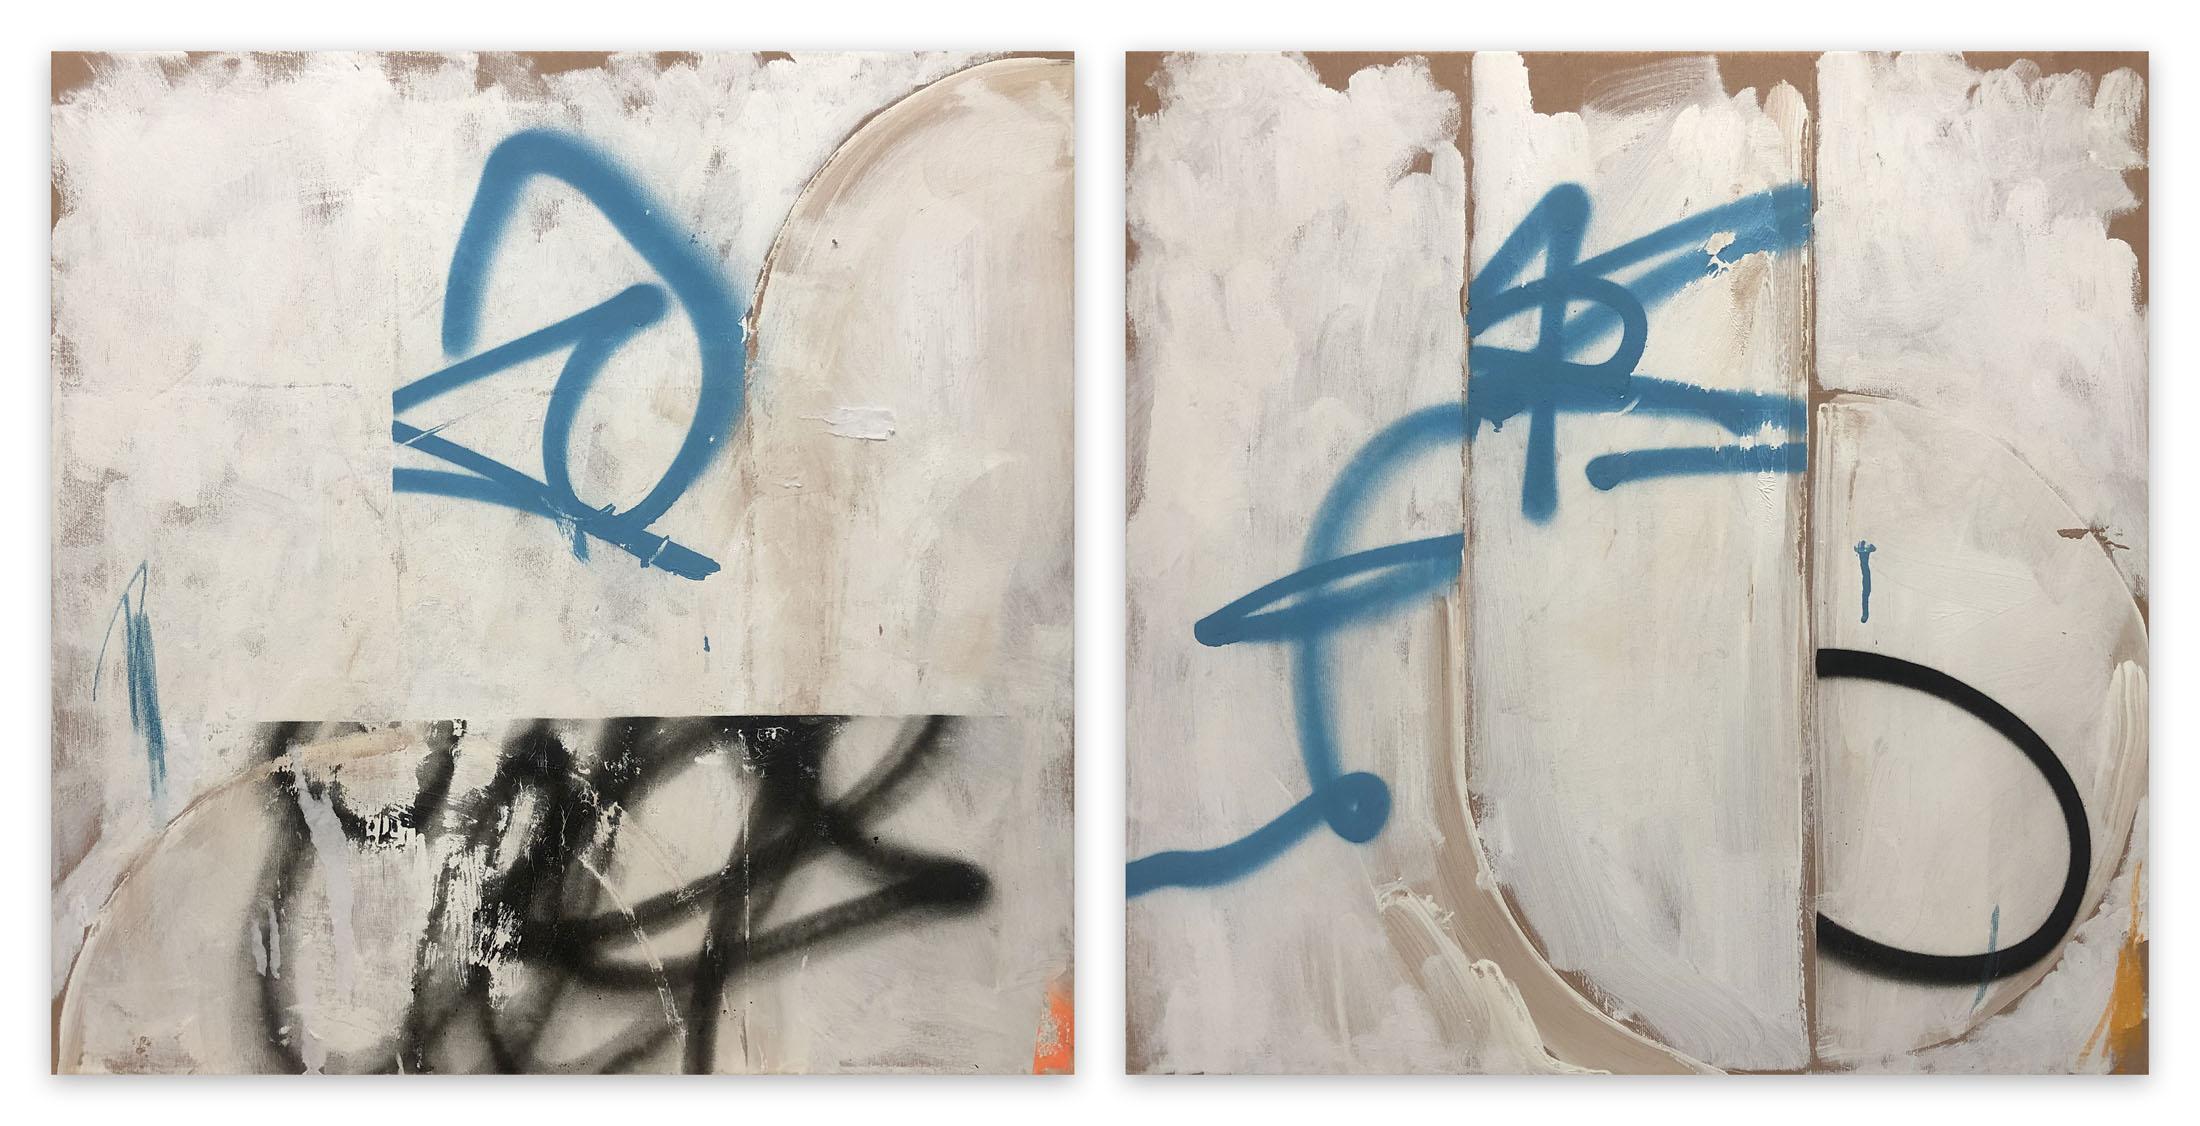 English broken 1&2 (Abstract painting)